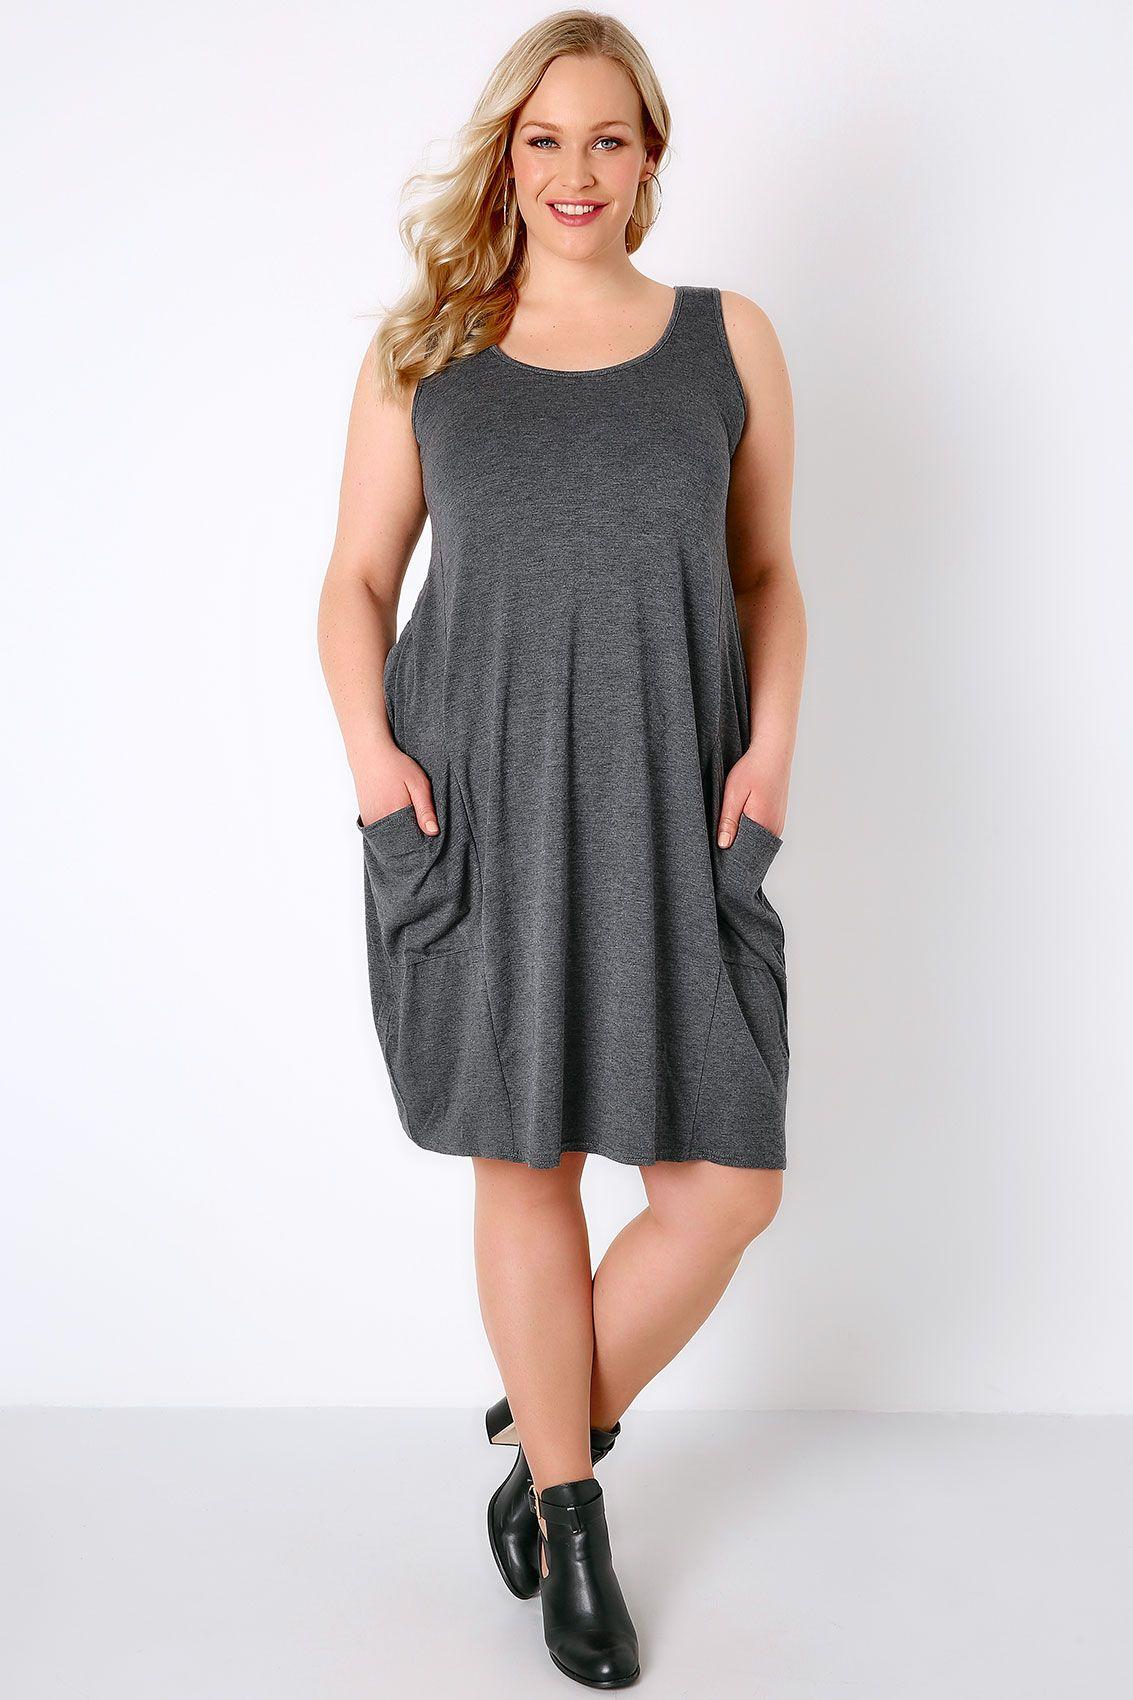 2931af288c5 Dark Grey Marl Drape Pocket Sleeveless Jersey Dress Plus Size 14 to 32